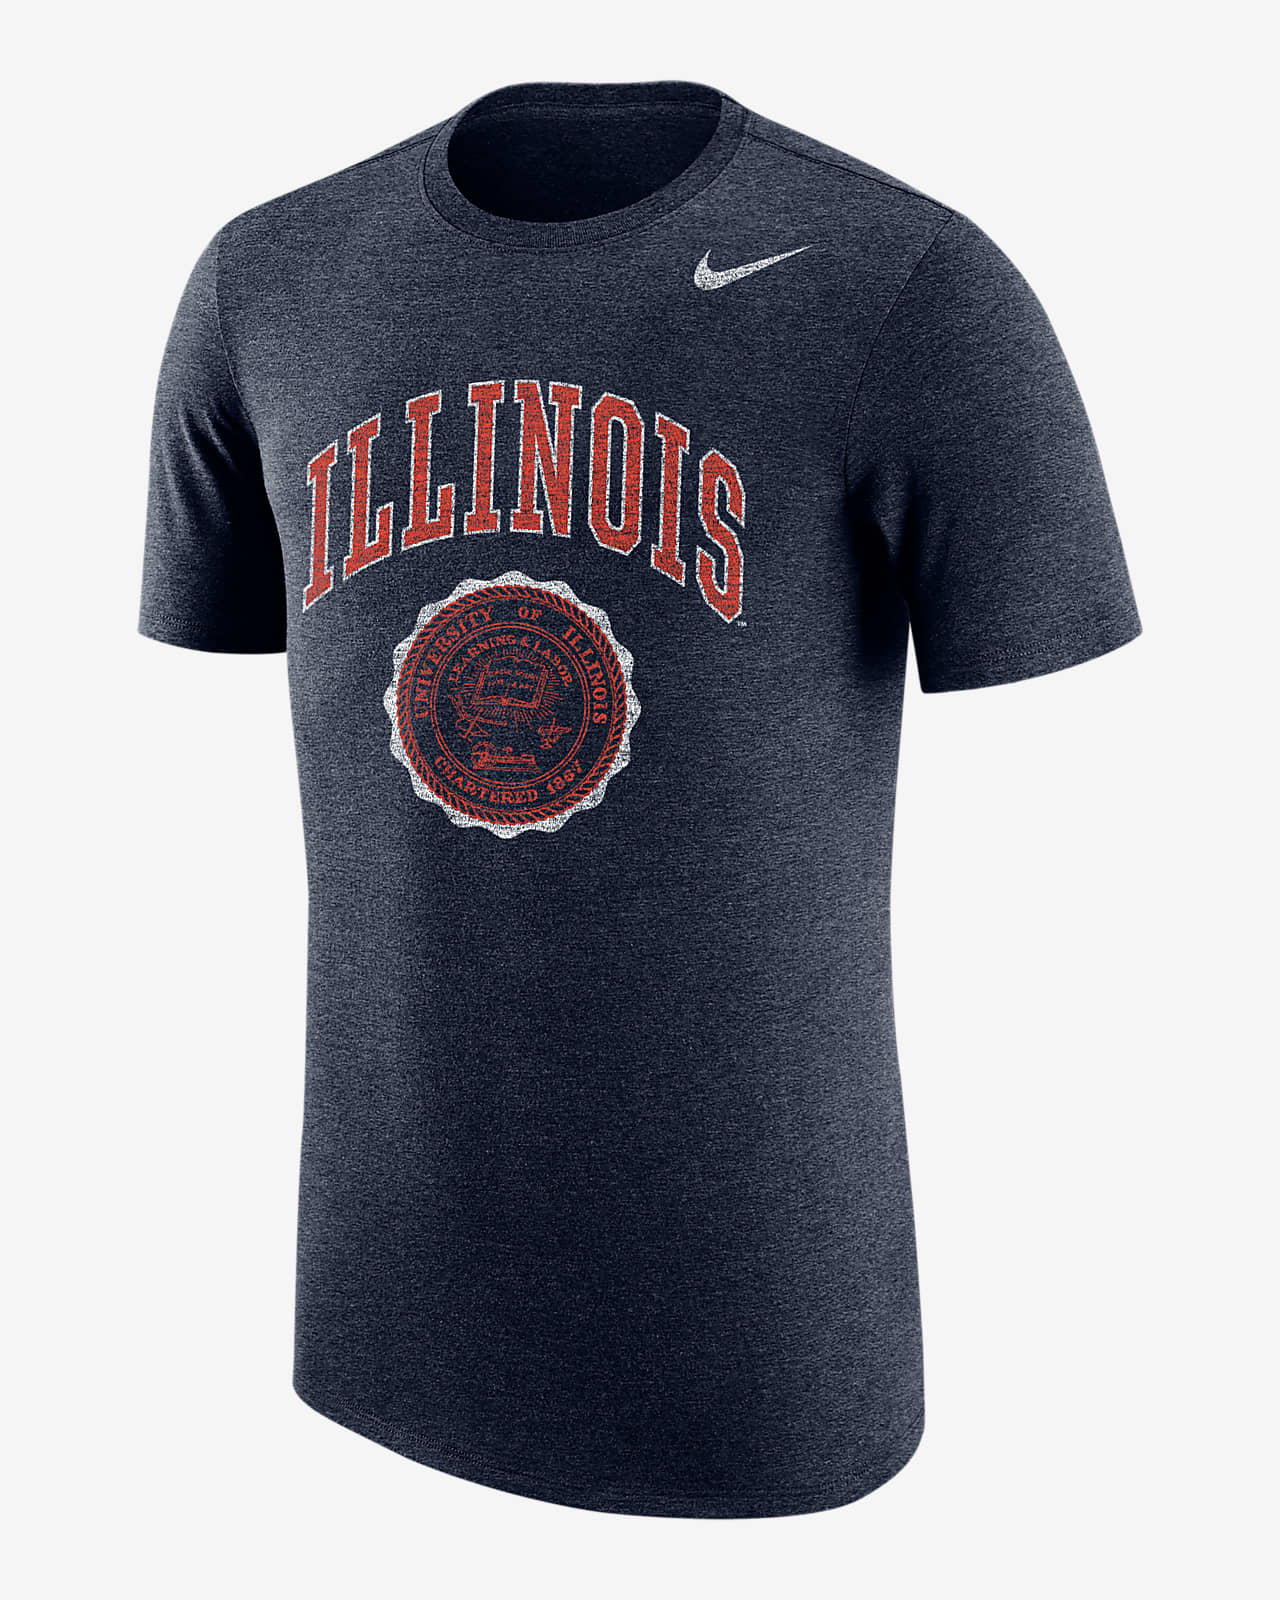 Nike College (Illinois) Men's T-Shirt